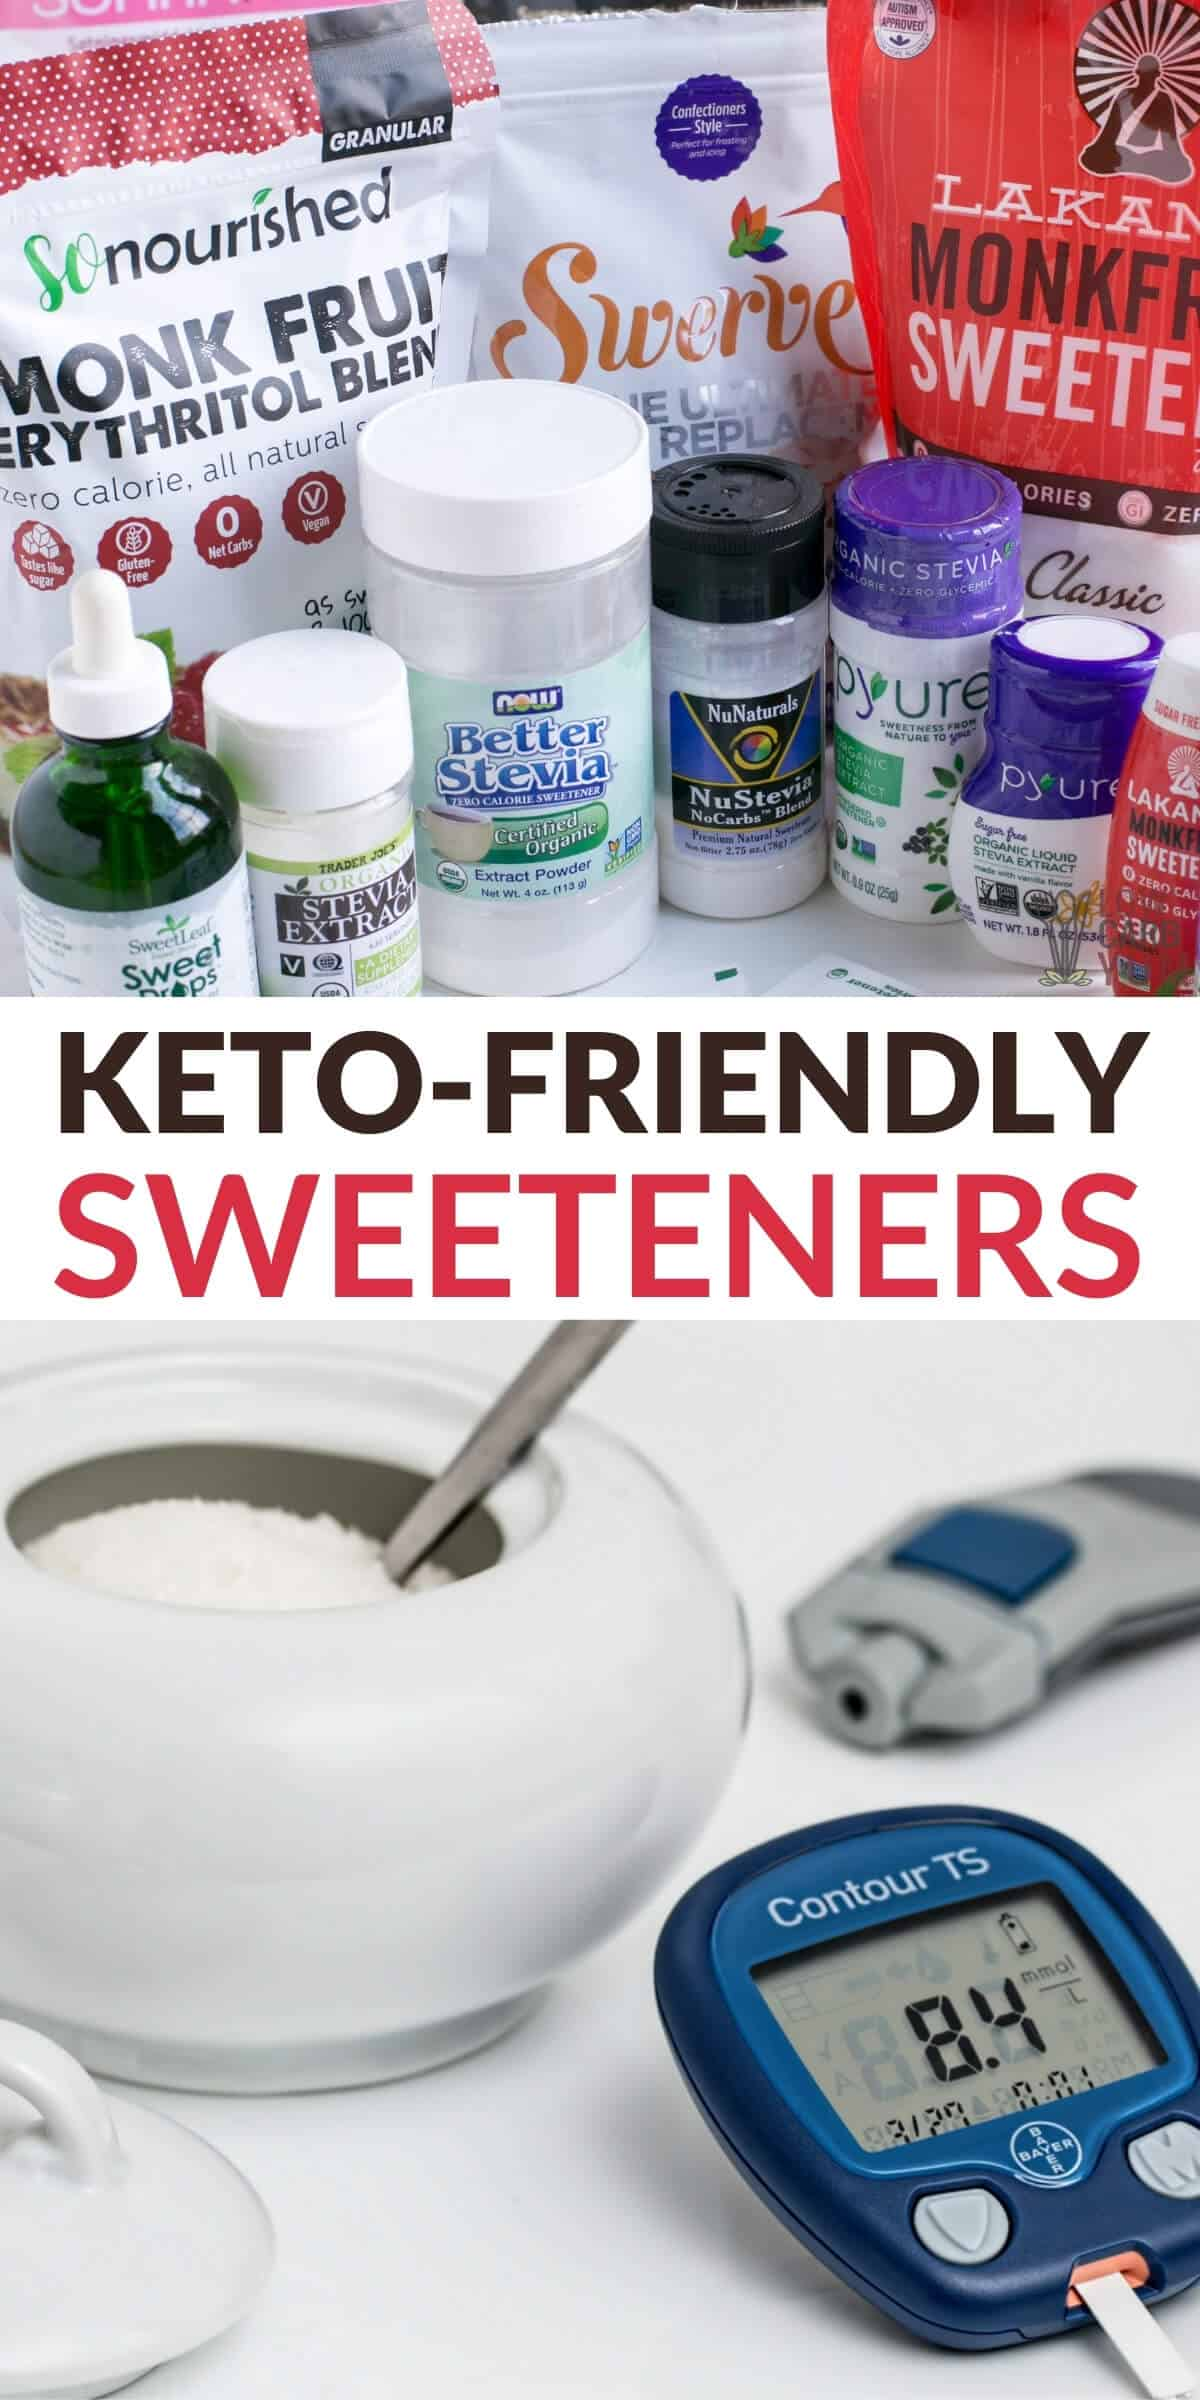 keto-friendly sweetener sugar substitutes